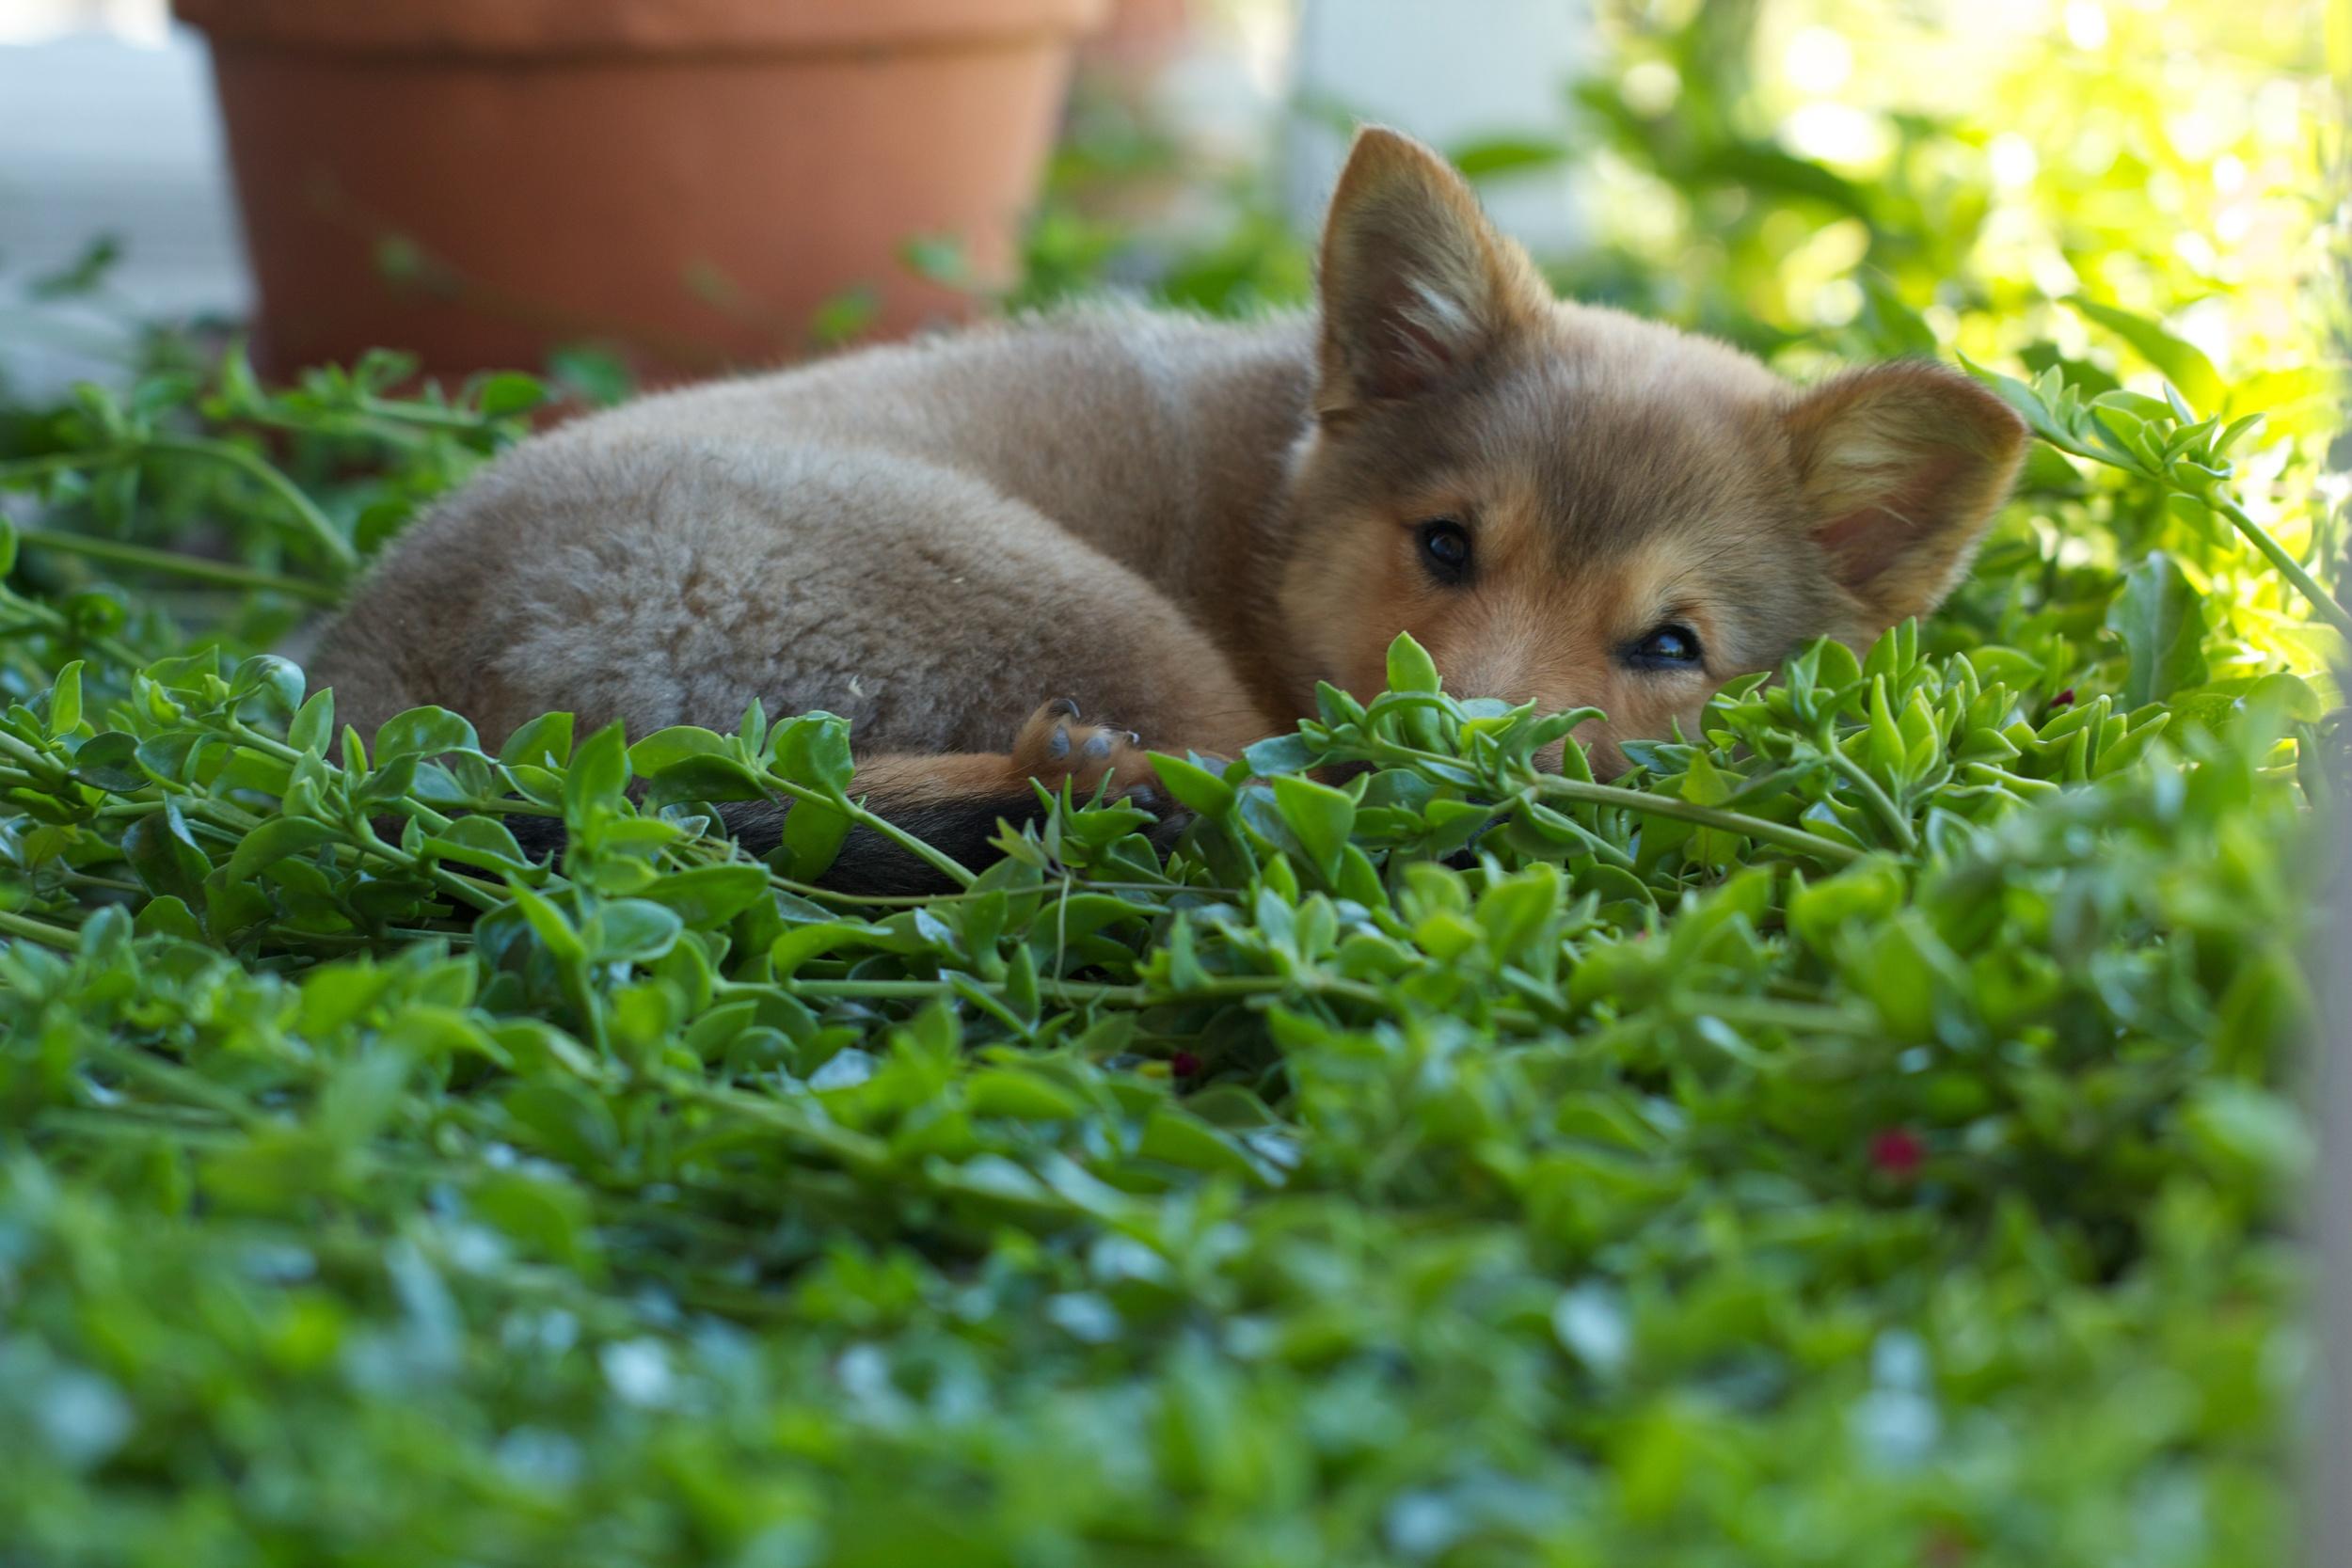 Boi , our Icelandic dog, at 12 weeks